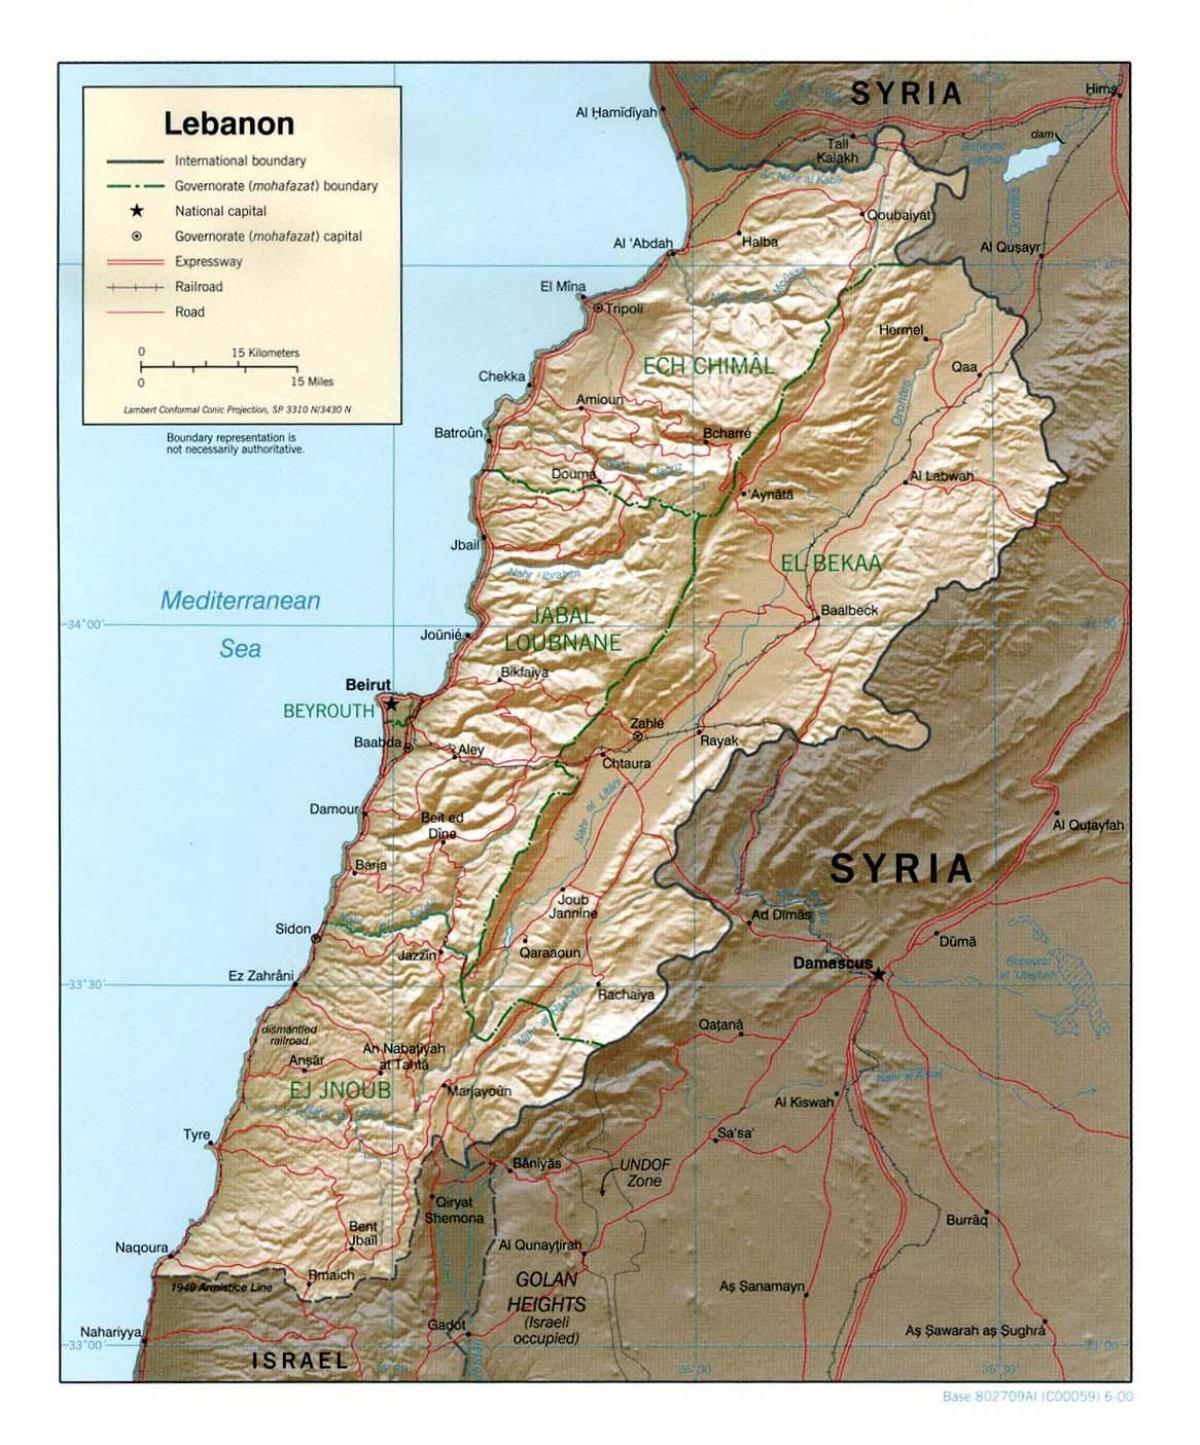 Cartina Del Libano.Libano Mappa Topografica Mappa Del Libano Topografica Asia Occidentale Asia